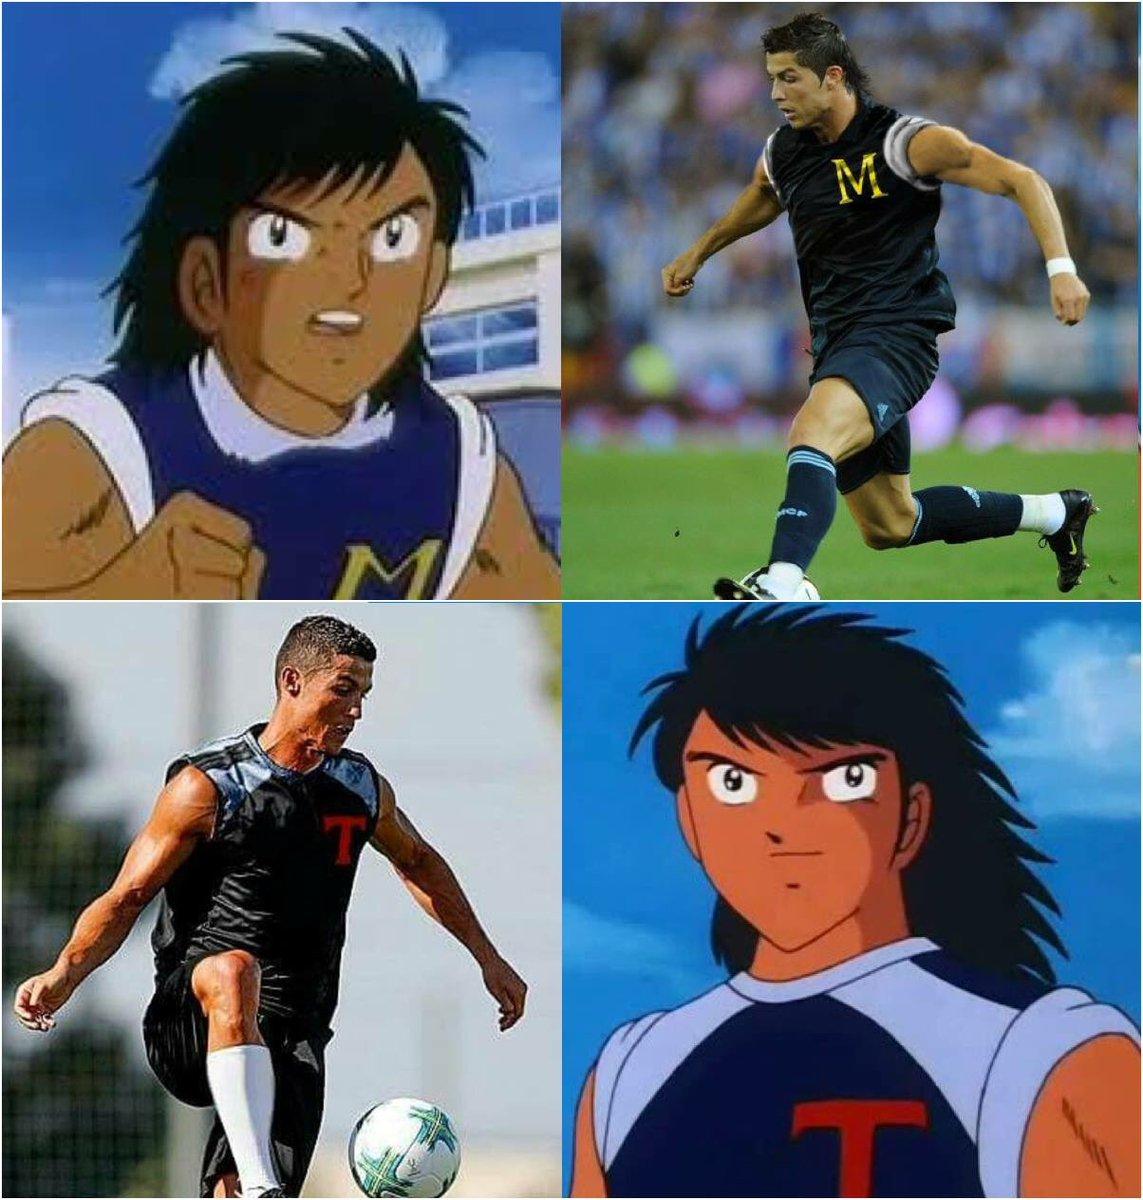 Captain Tsubasa France 🇫🇷 (@CapTsubasaFR)